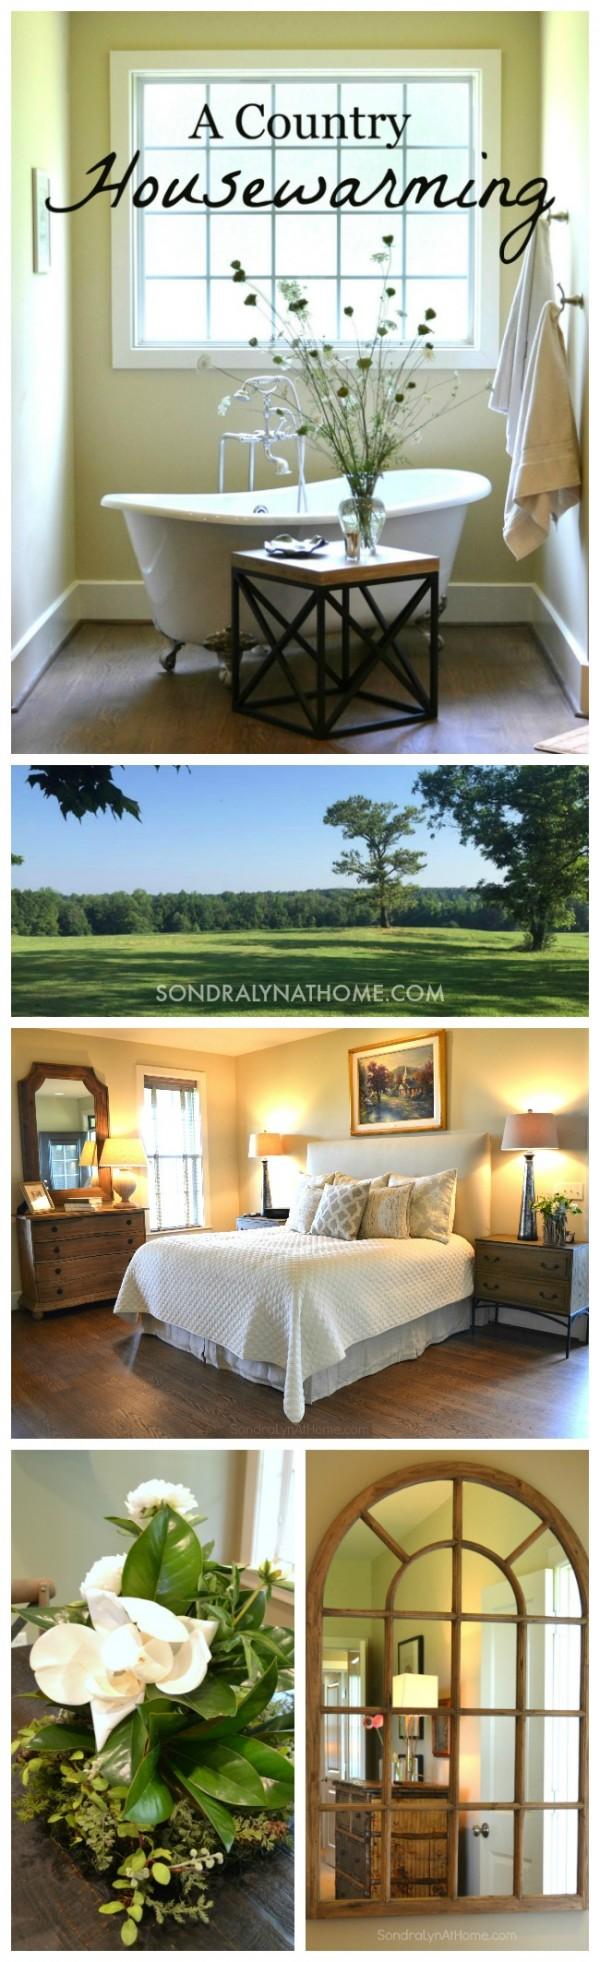 A Country Housewarming - Pinnable - Sondra Lyn at Home-